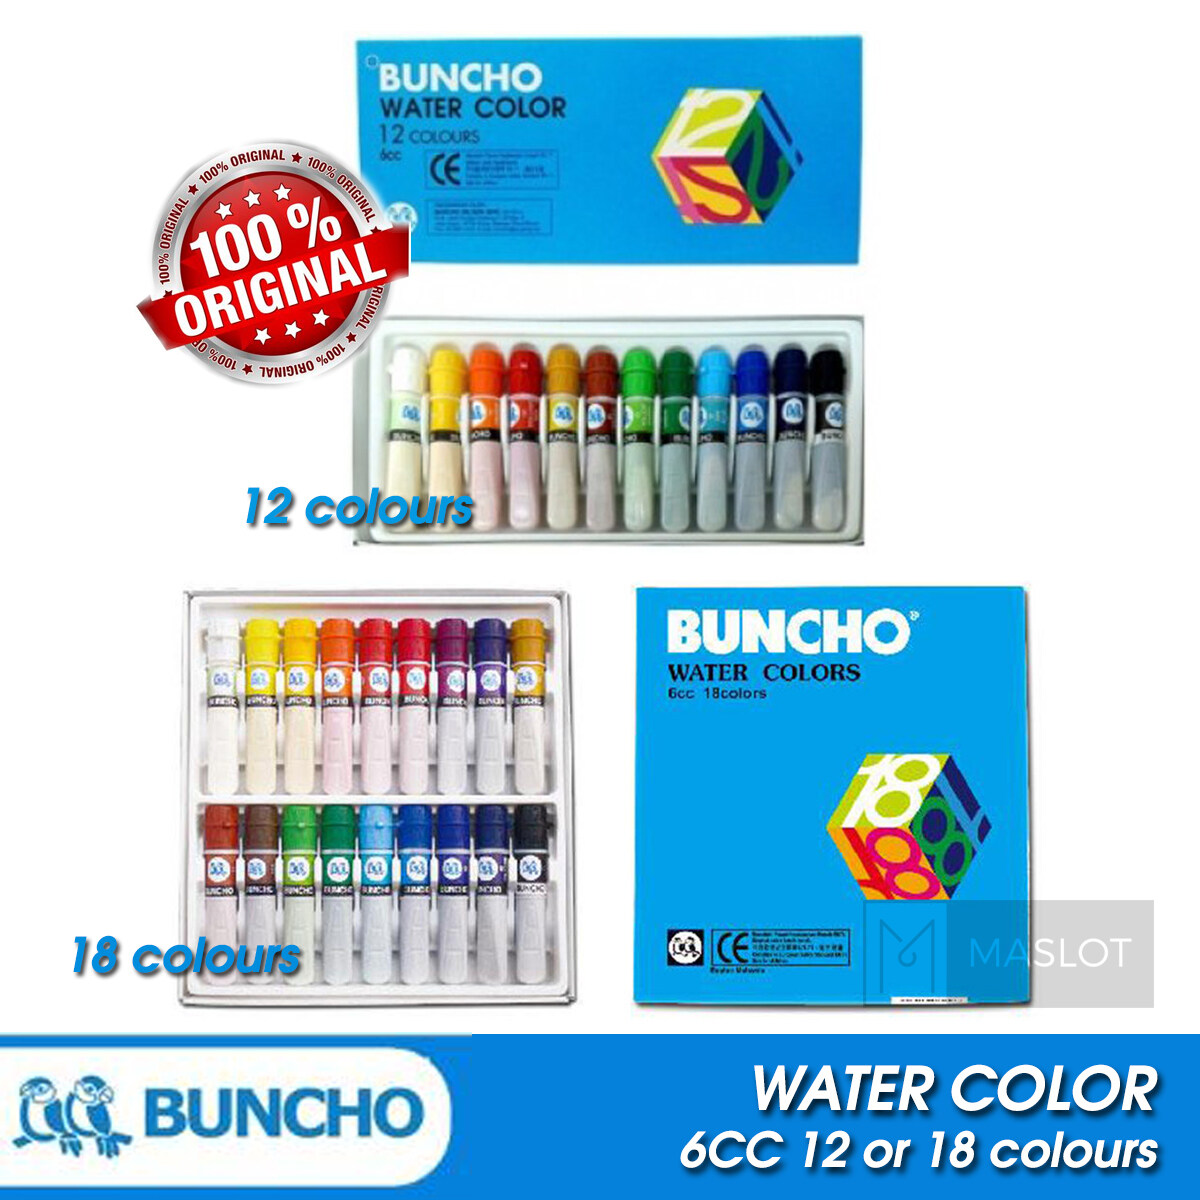 Senarai Harga 24 Buncho Crayon Terkini Di Malaysia Paling Laris